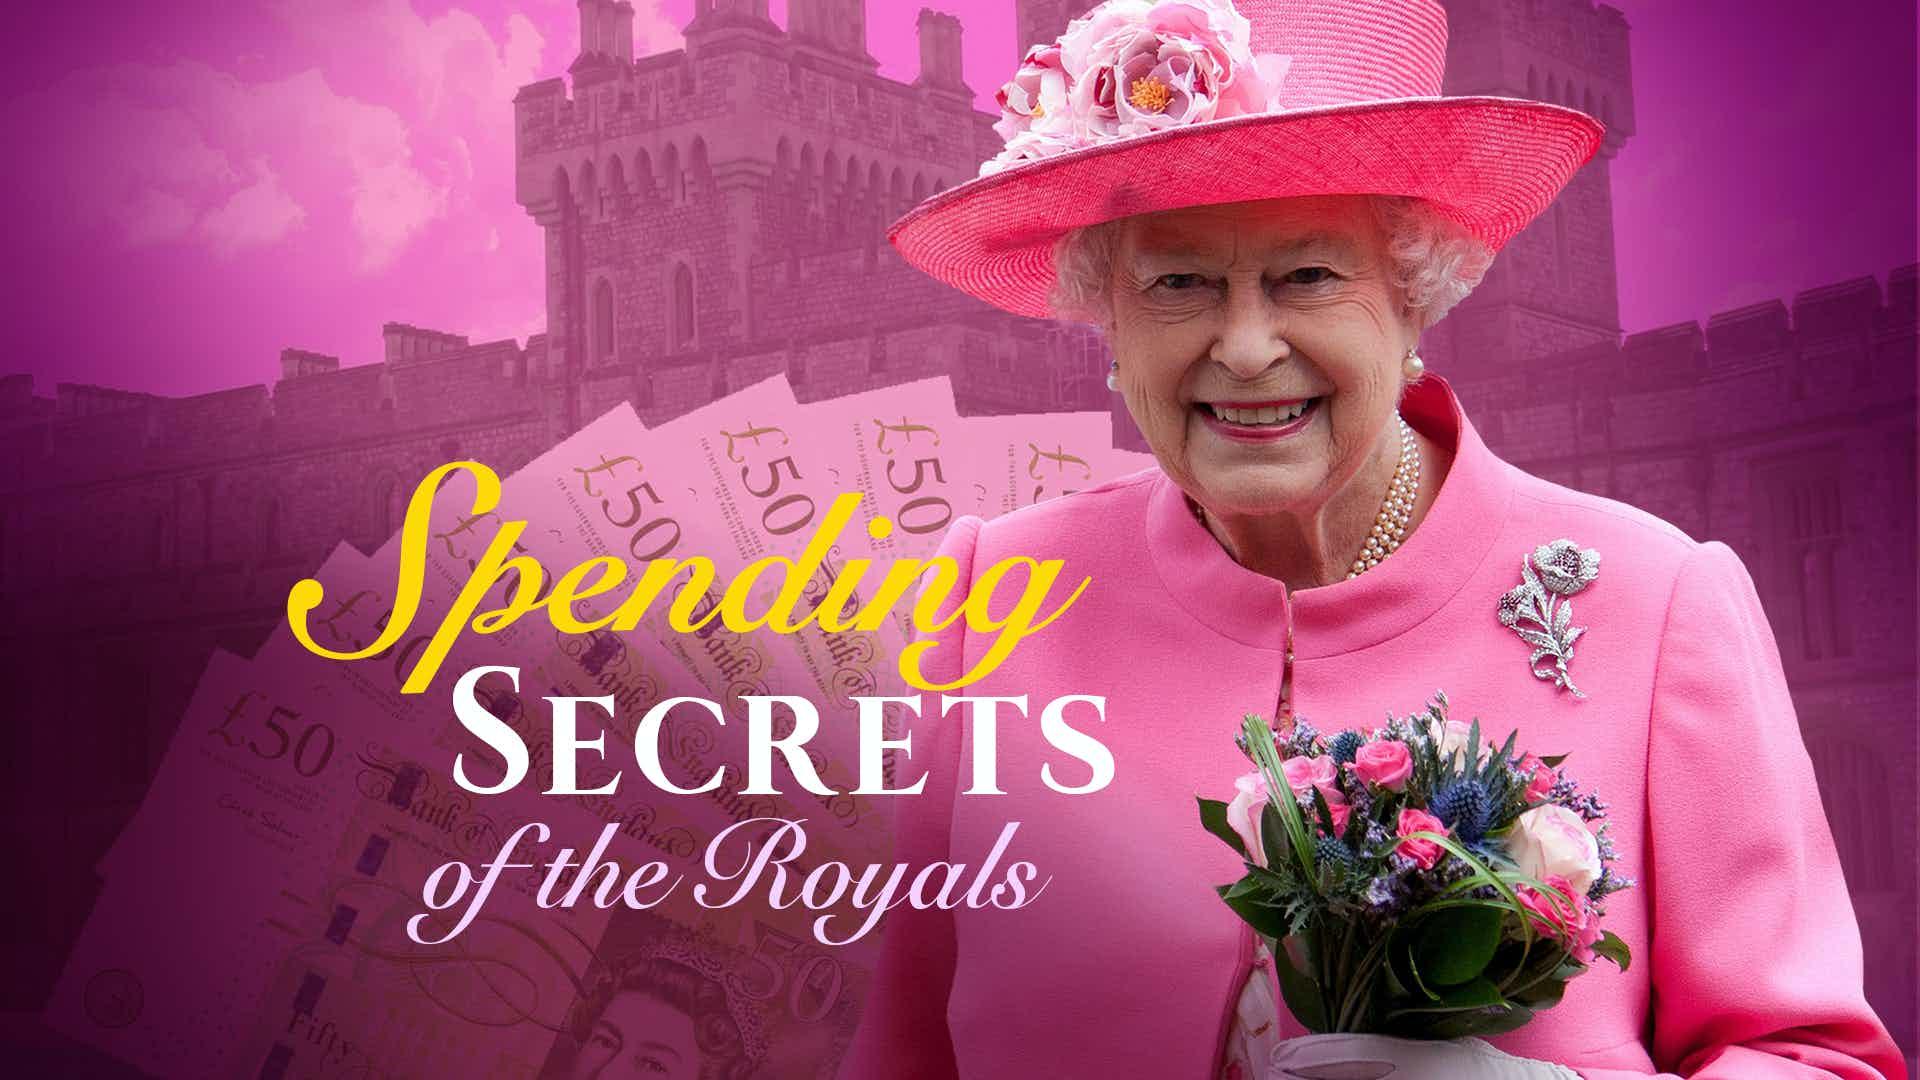 Spending Secrets of the Royals